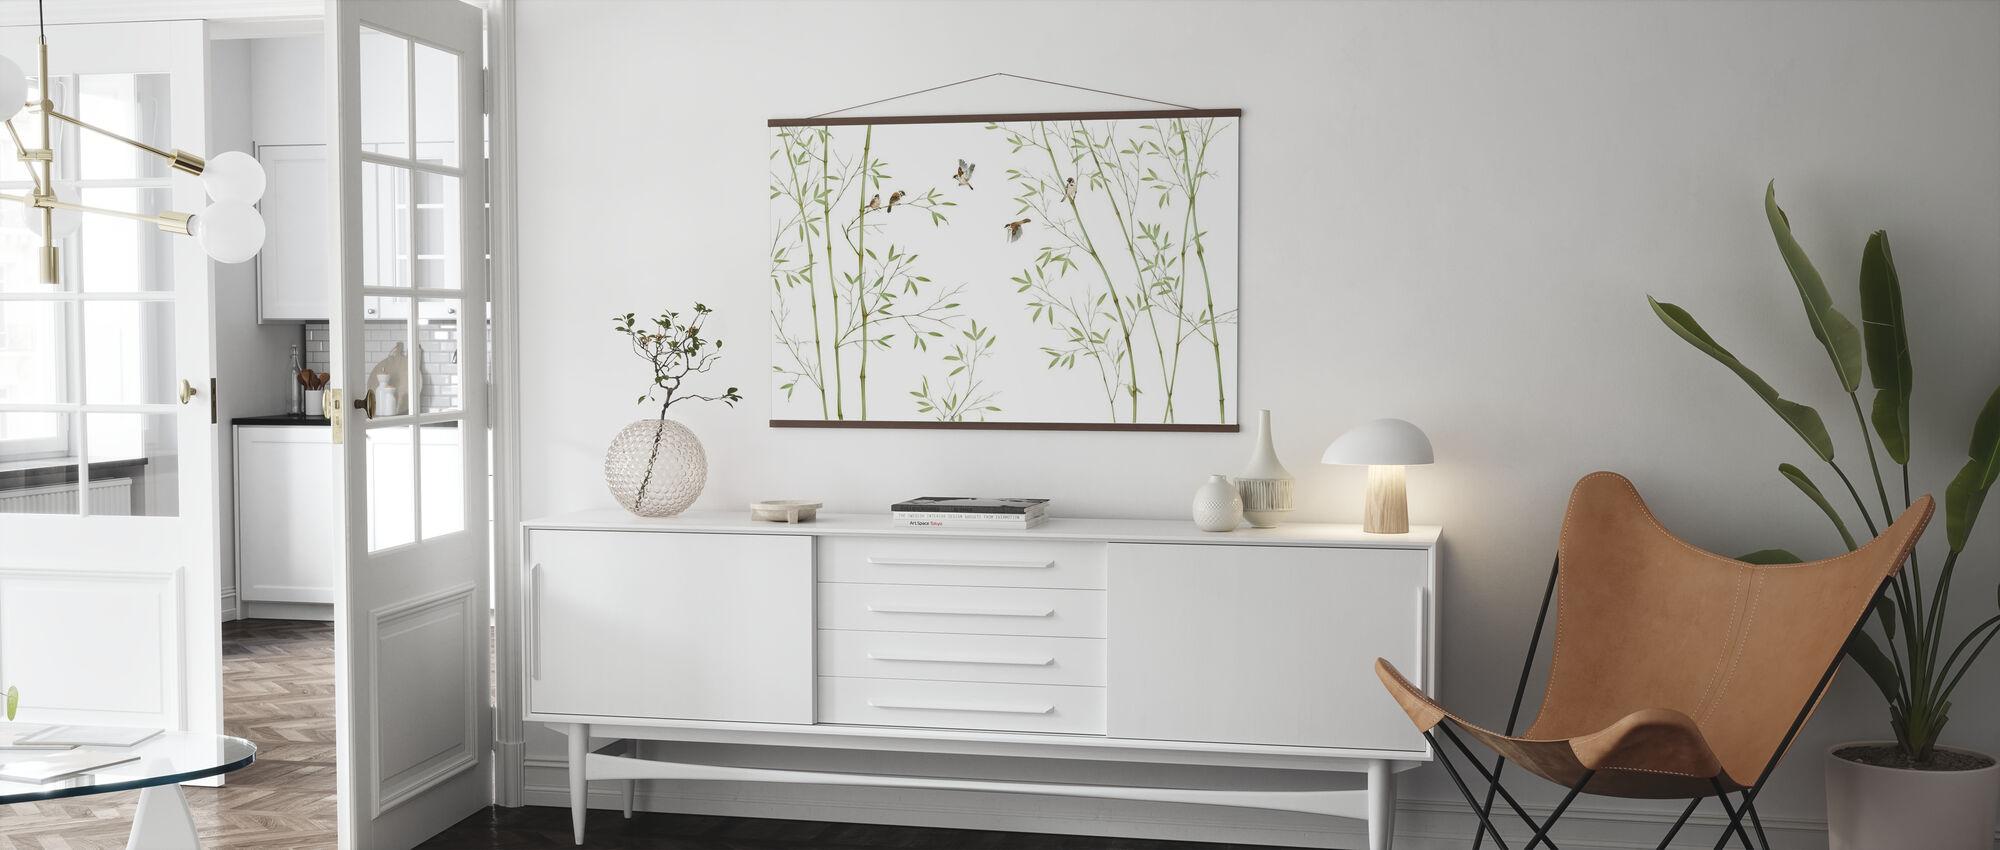 Bamboe Vogels - Poster - Woonkamer